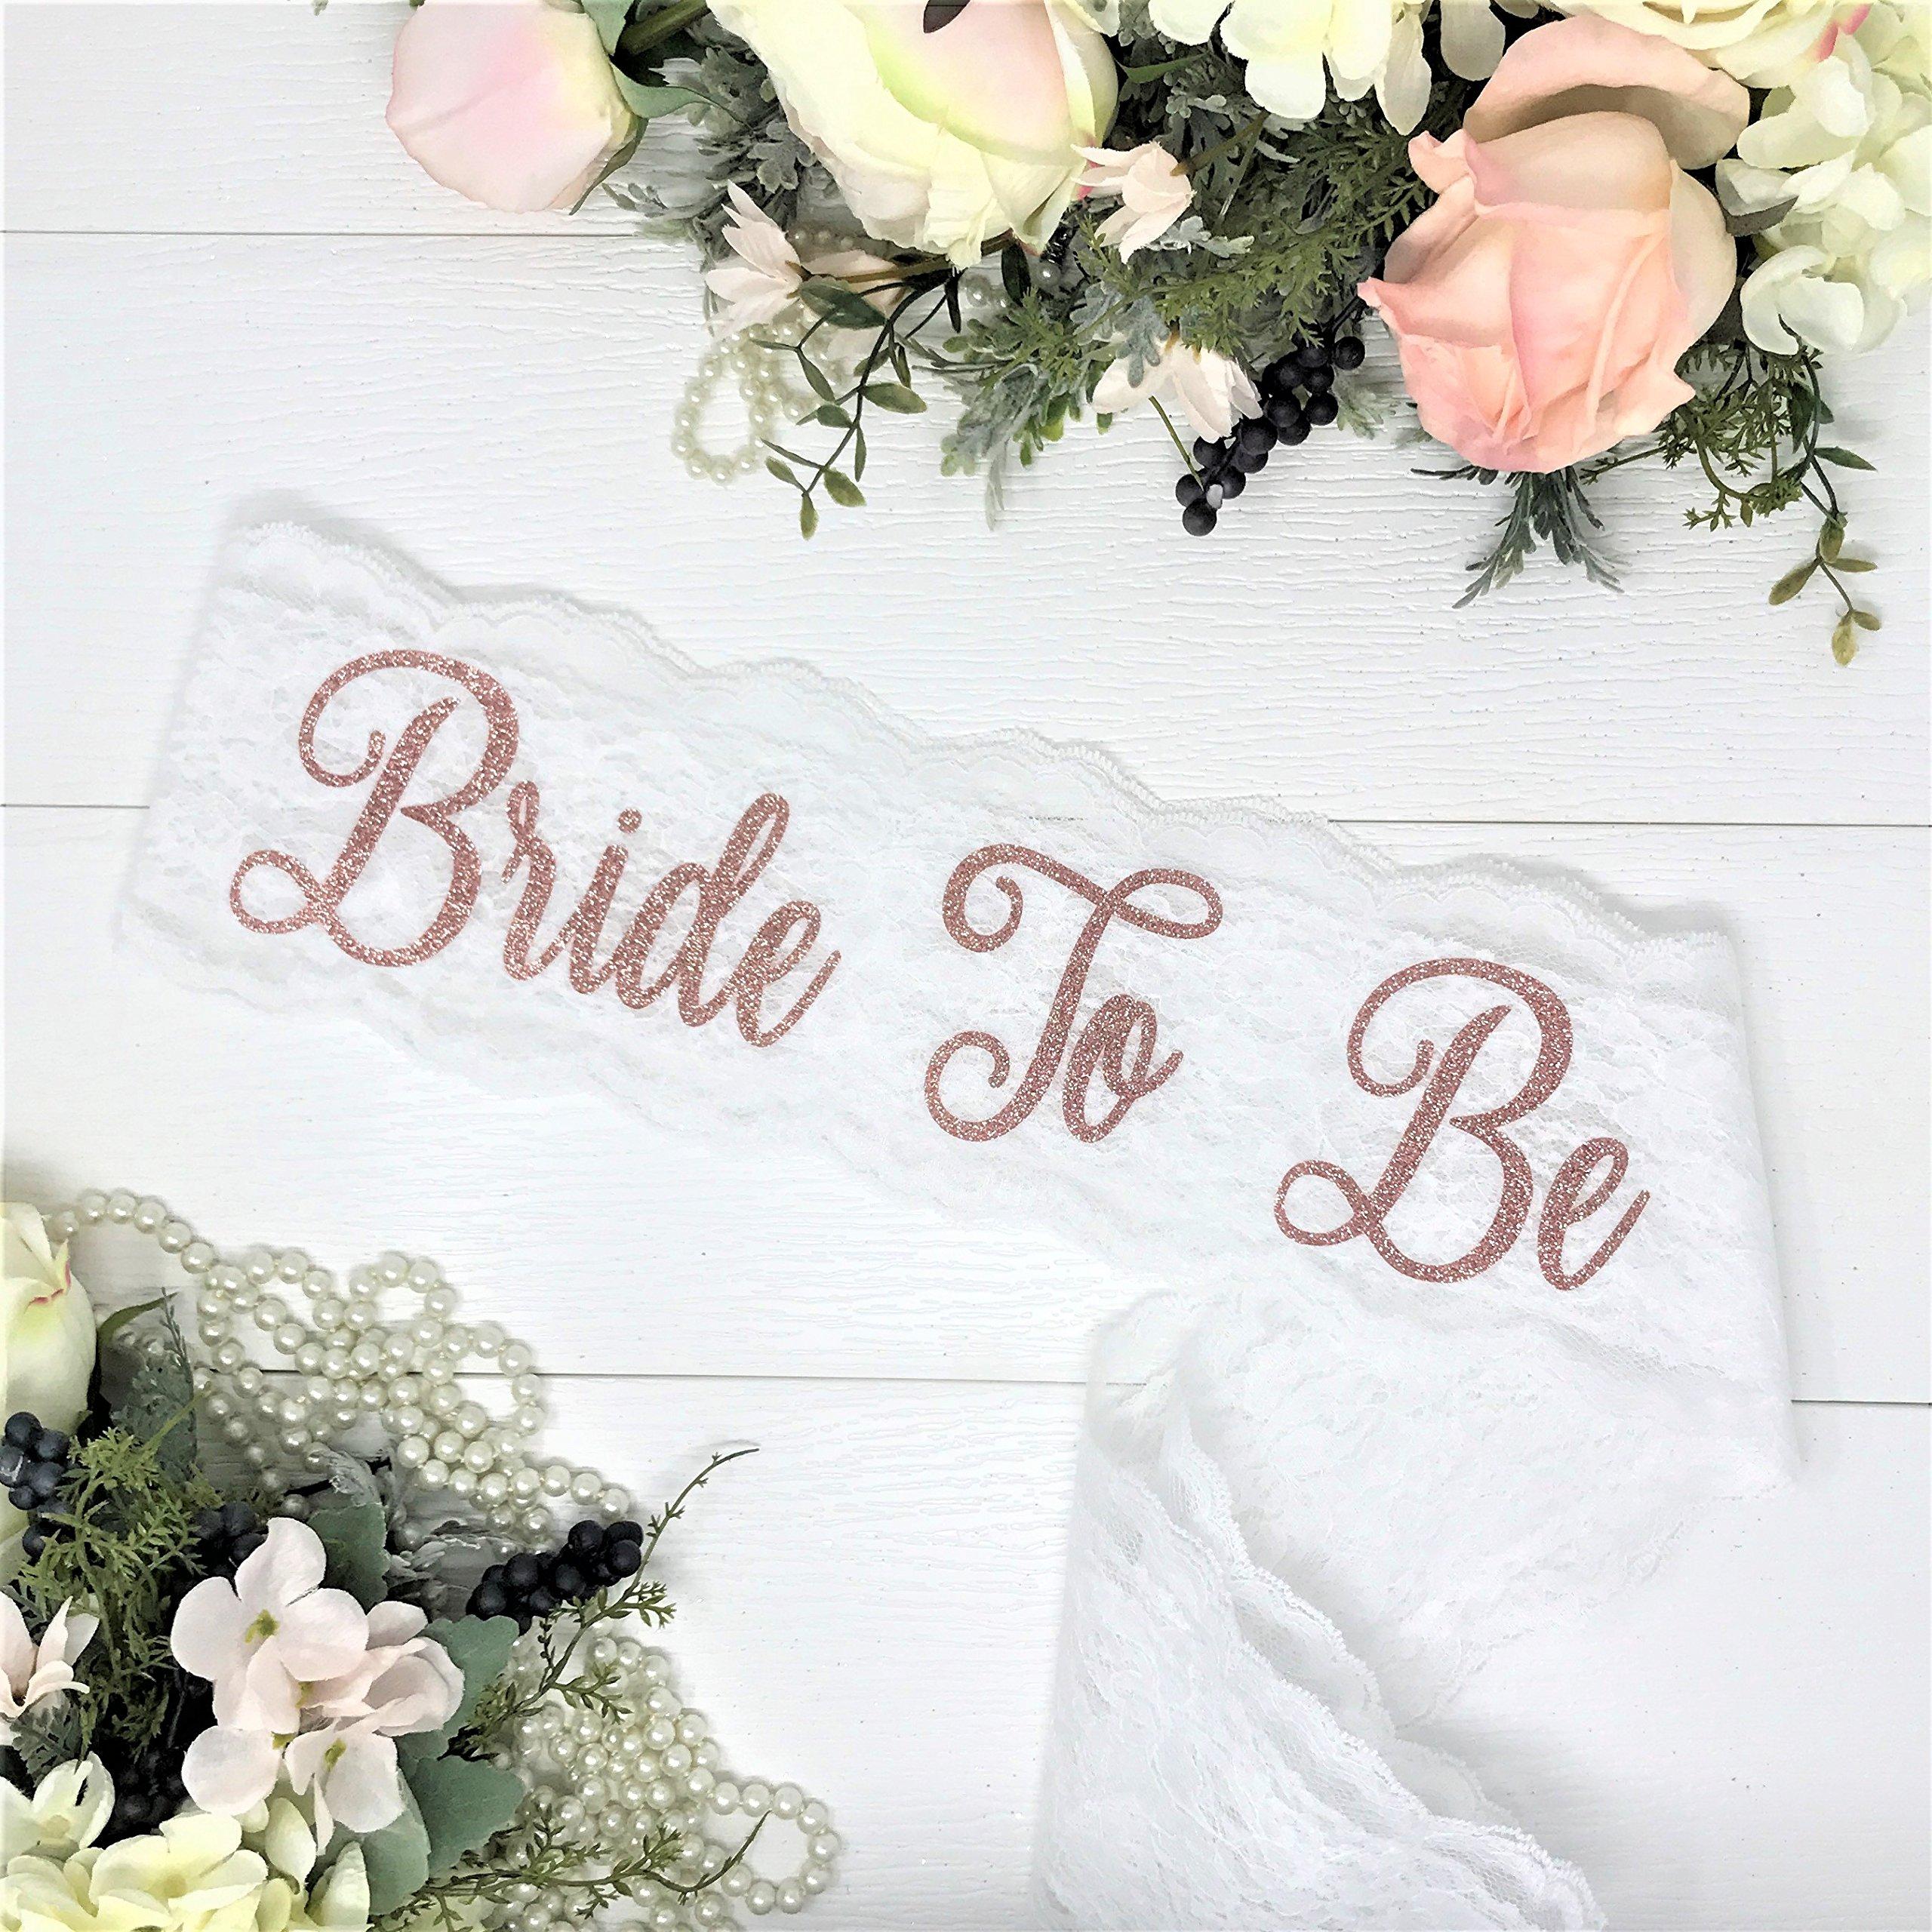 Lace Bachelorette Sash - White Lace - Rose Gold ''Bride To Be''